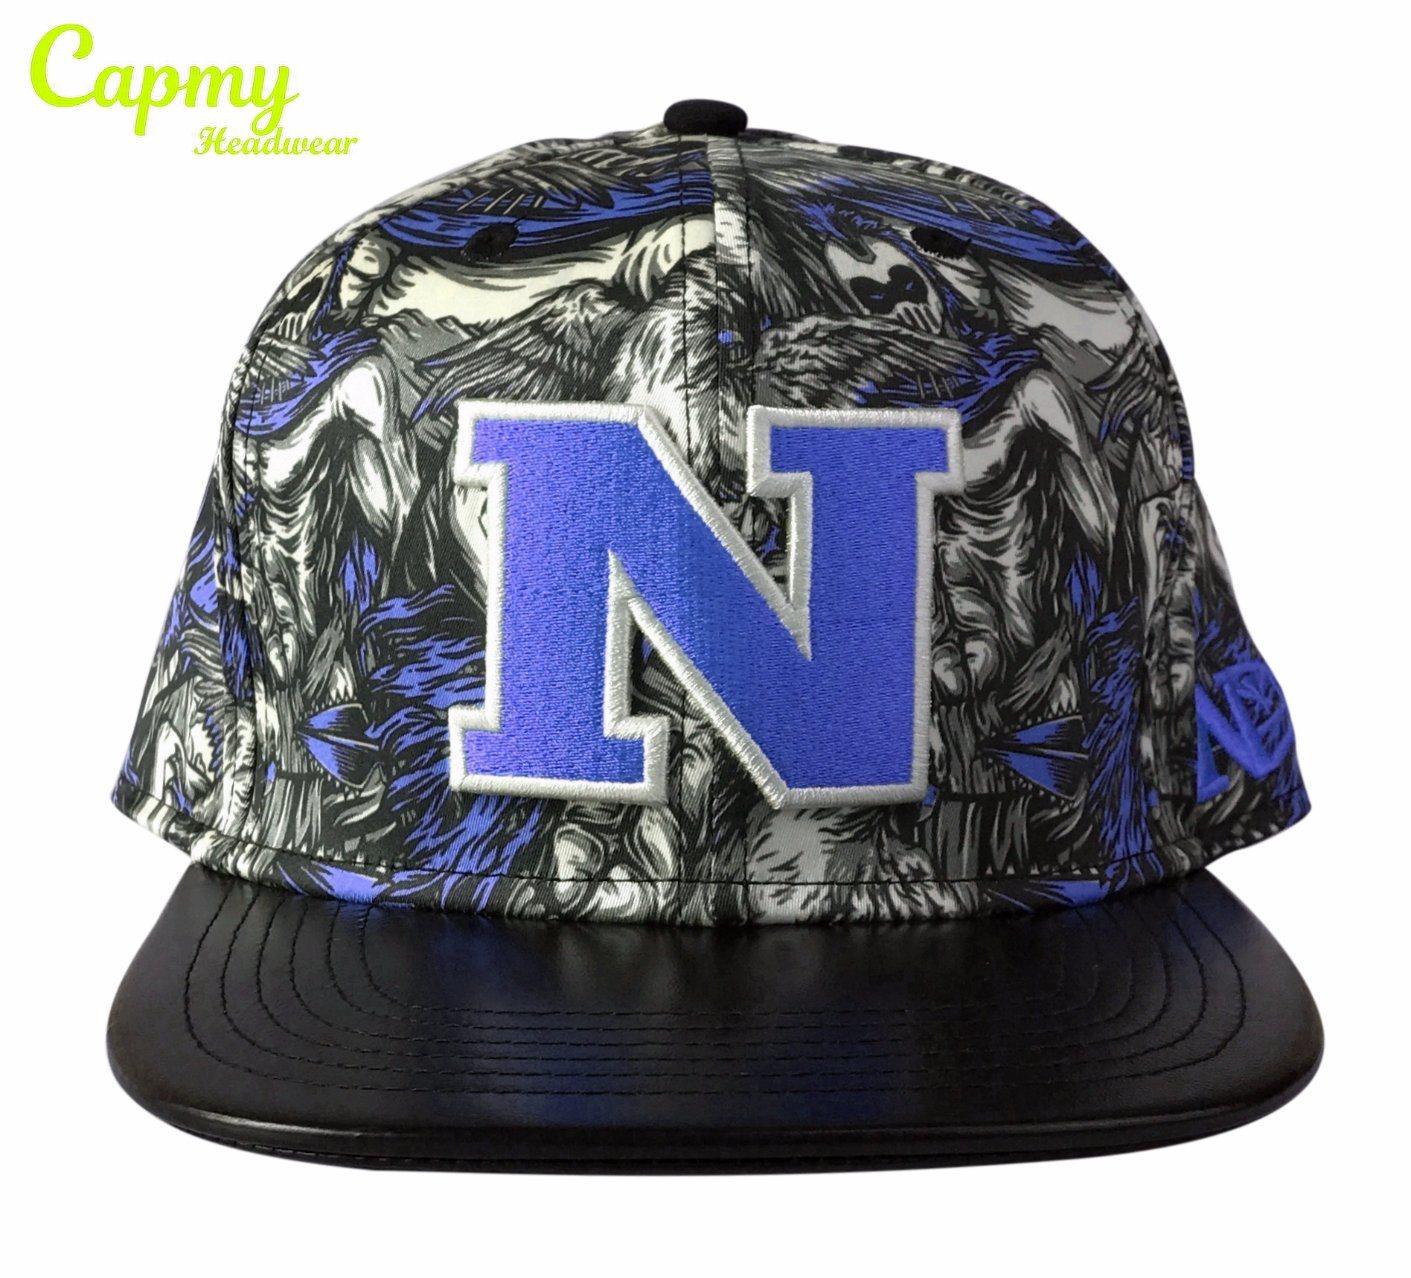 d418b48adcf99 China Fake Leather Brim Cap with 6 Panel Snapback Cap - China Cap ...